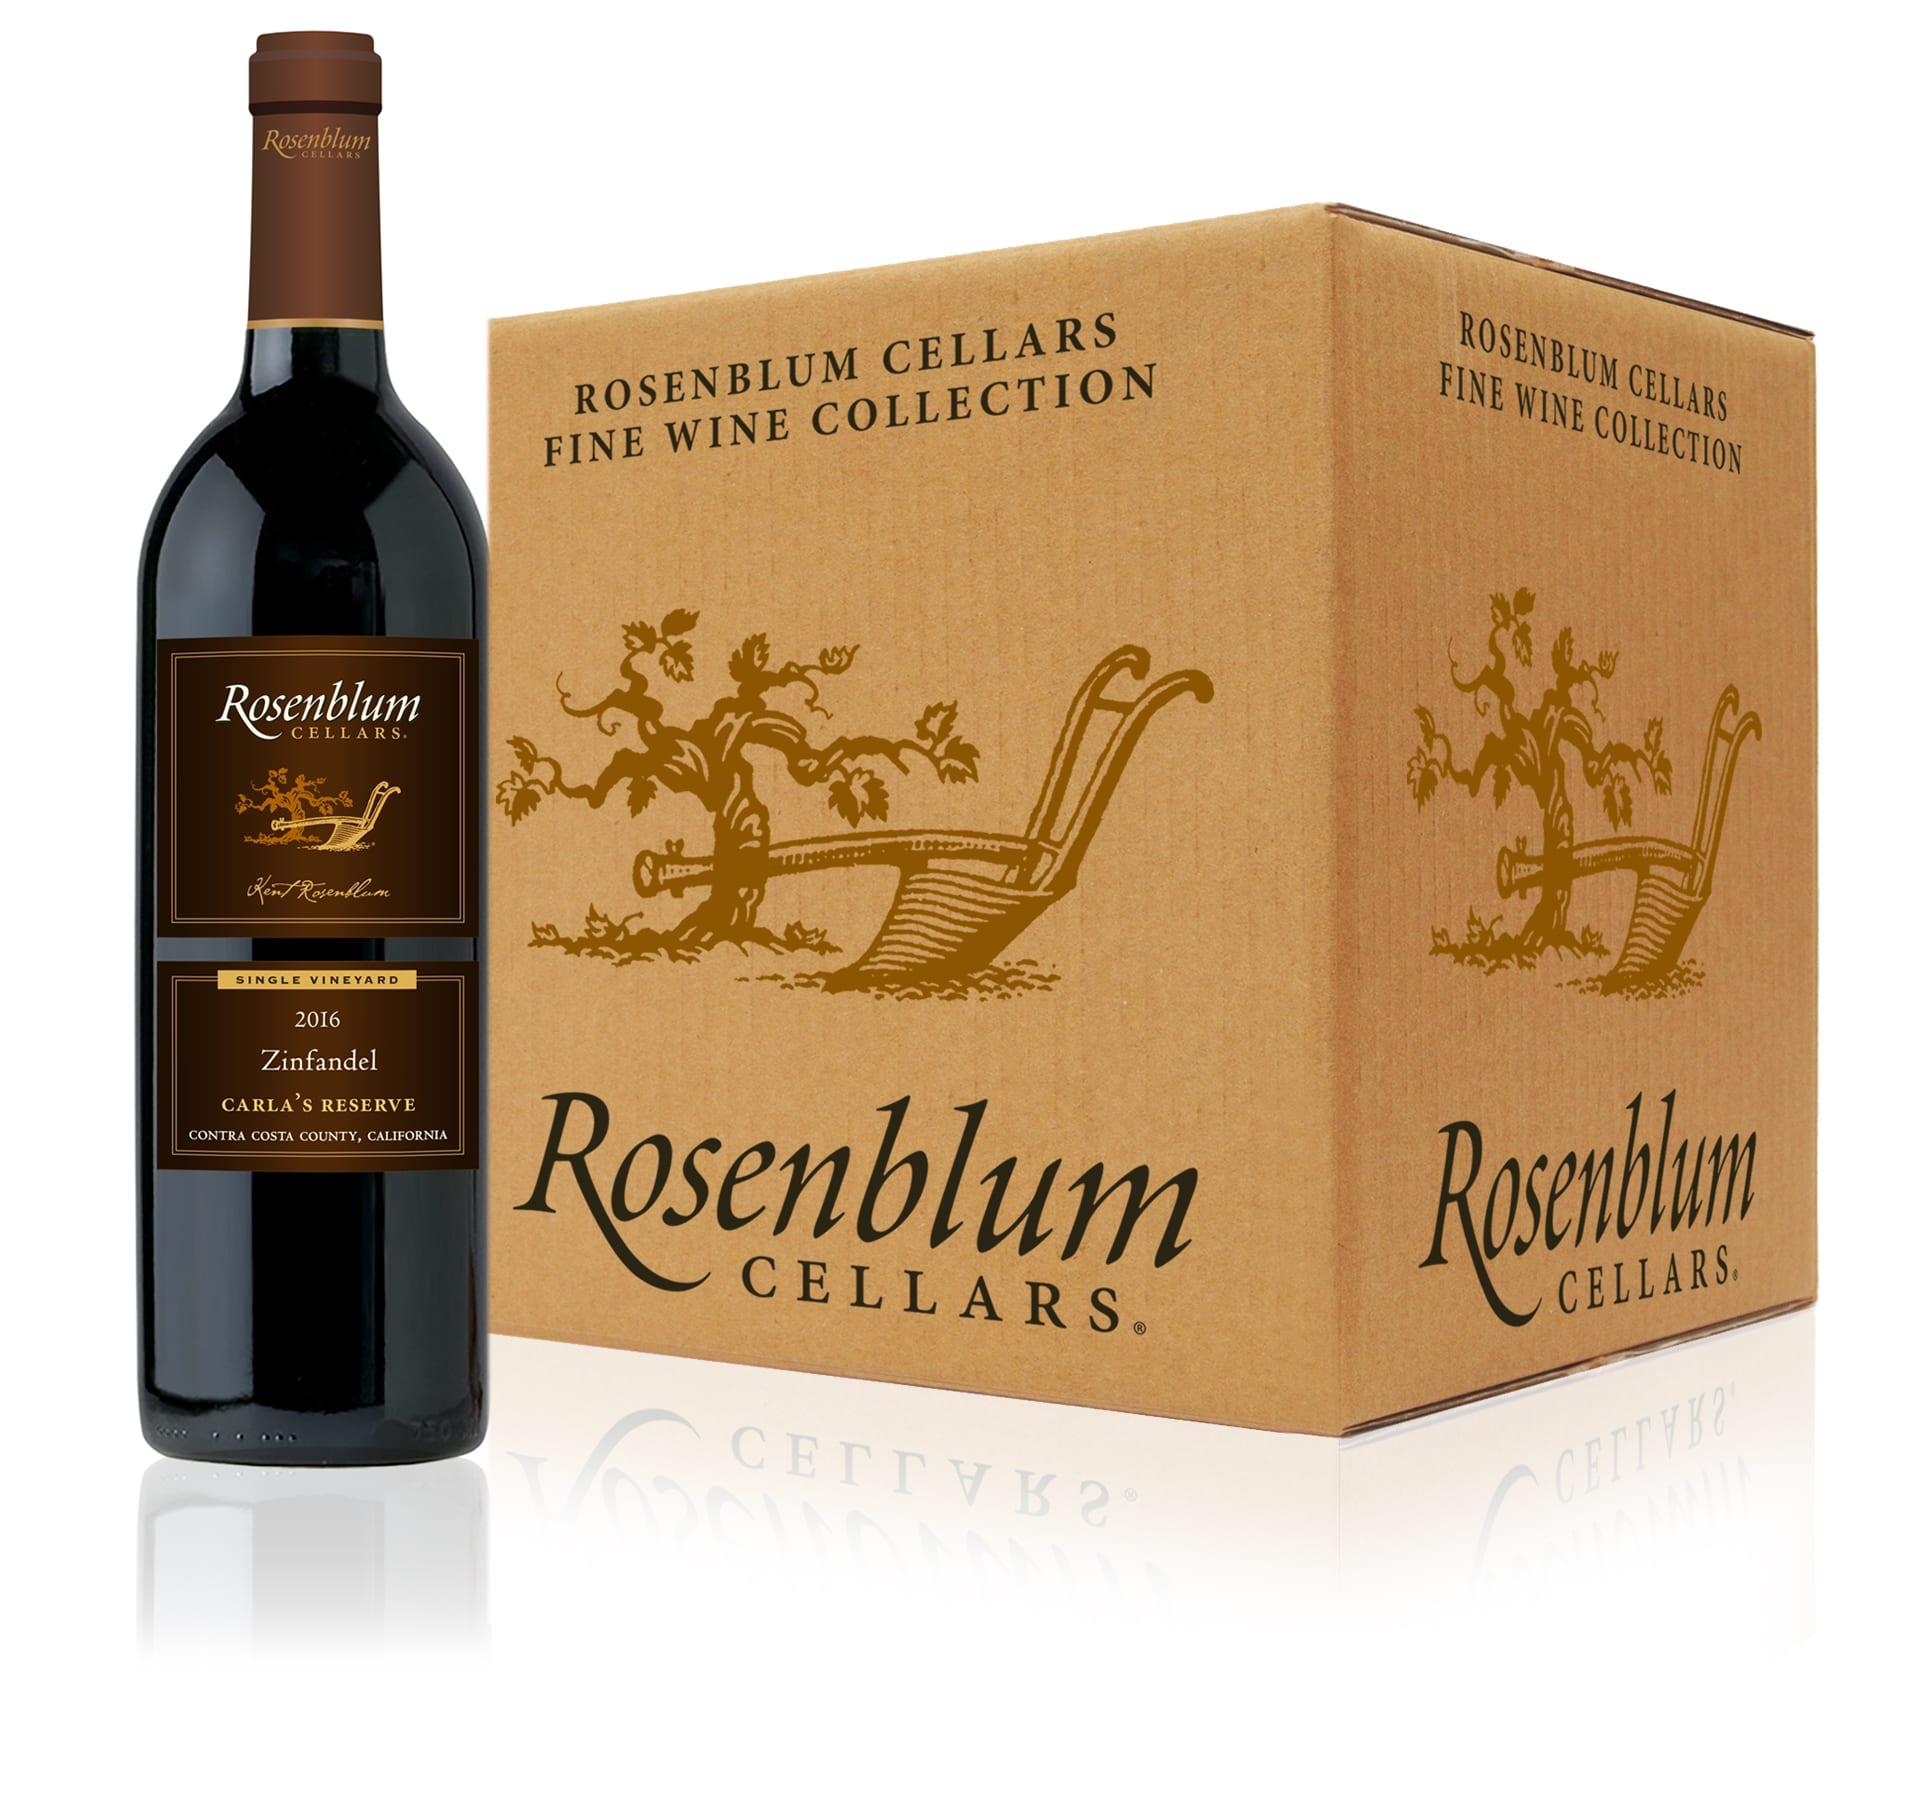 Rosenblum Cellars